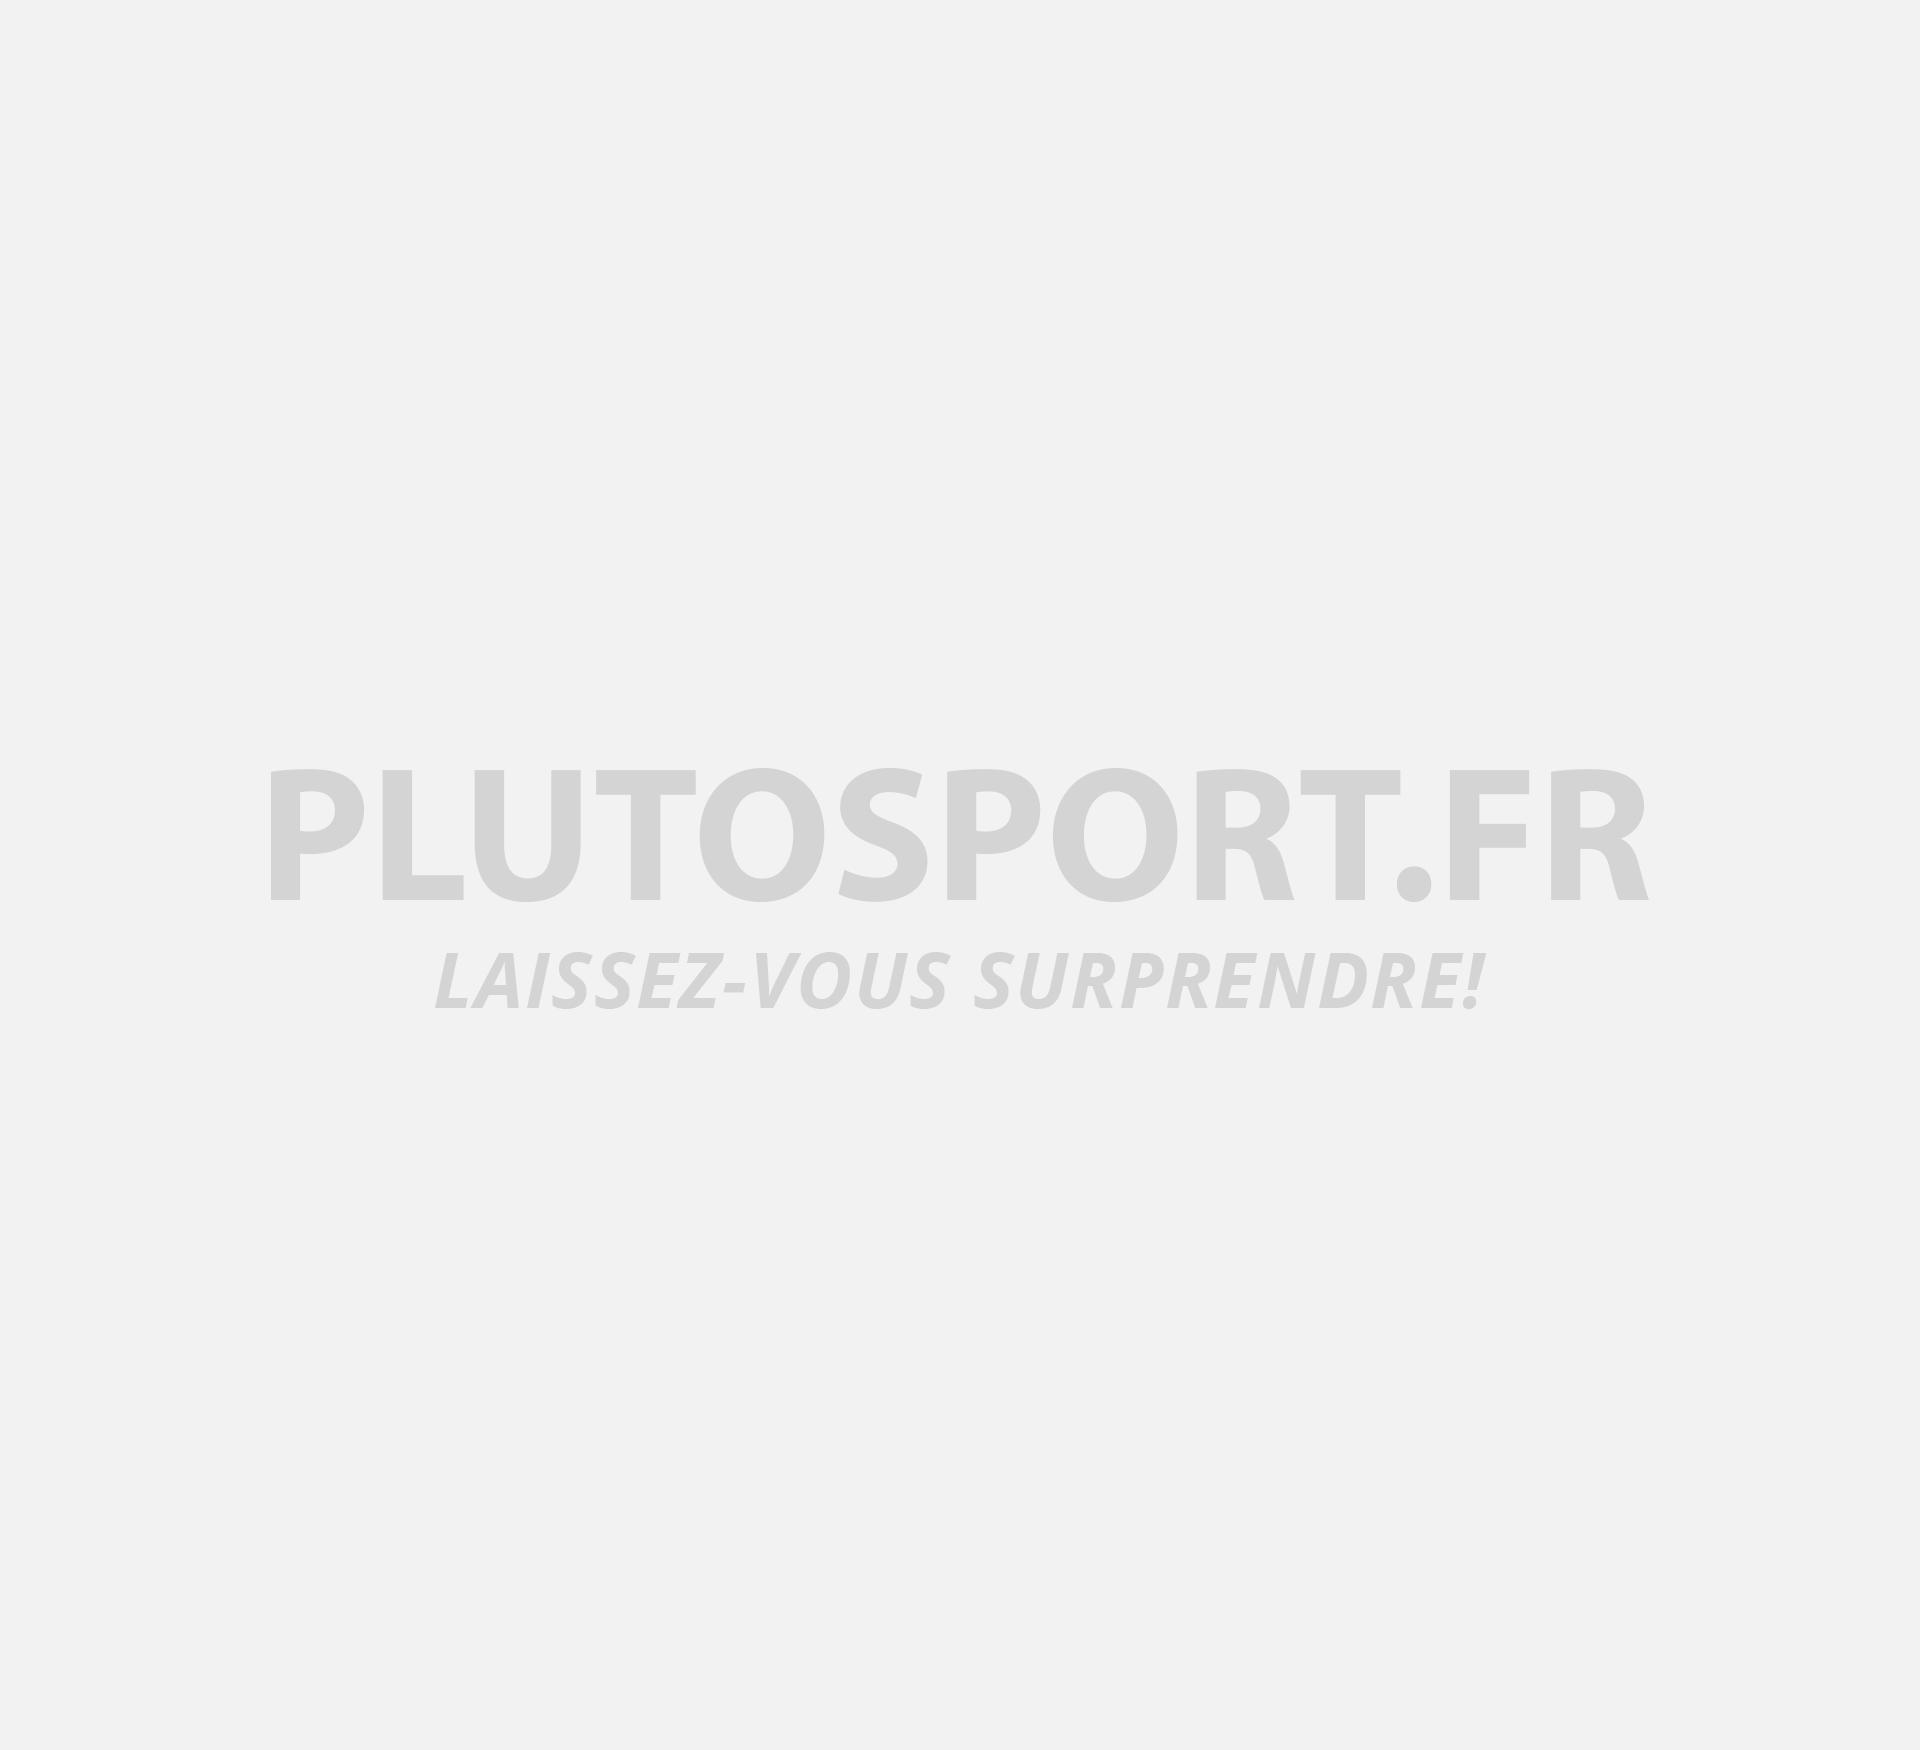 Nike Gilet Pour À Hoodie Hommes Capuche Team 19 Club Le Fz rdtshQ